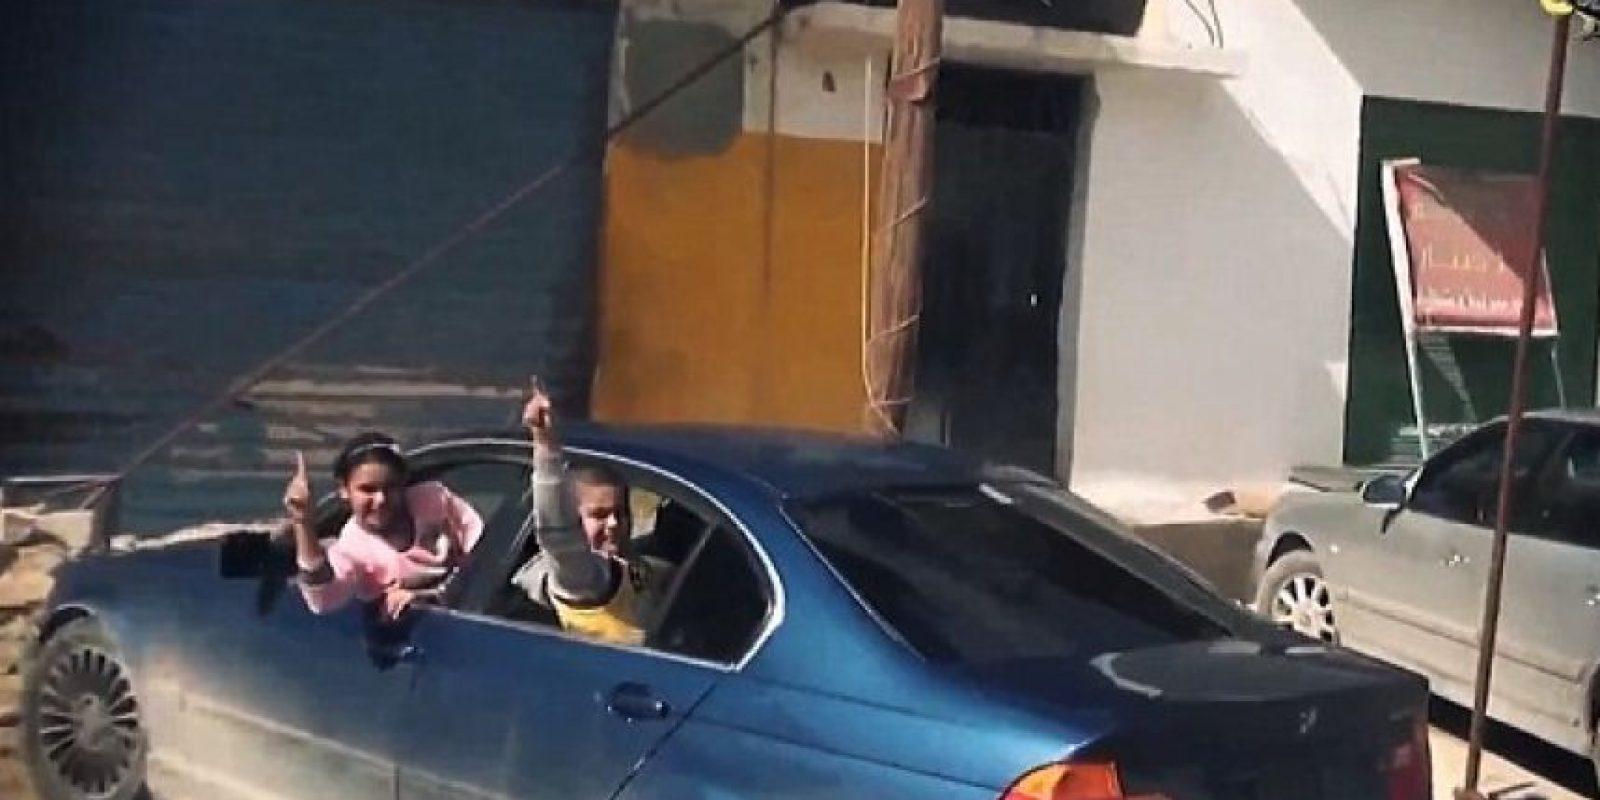 1. Esta semana ISIS decapitó a 21 cristianos egipcios en Libia. Foto:Captura de pantalla